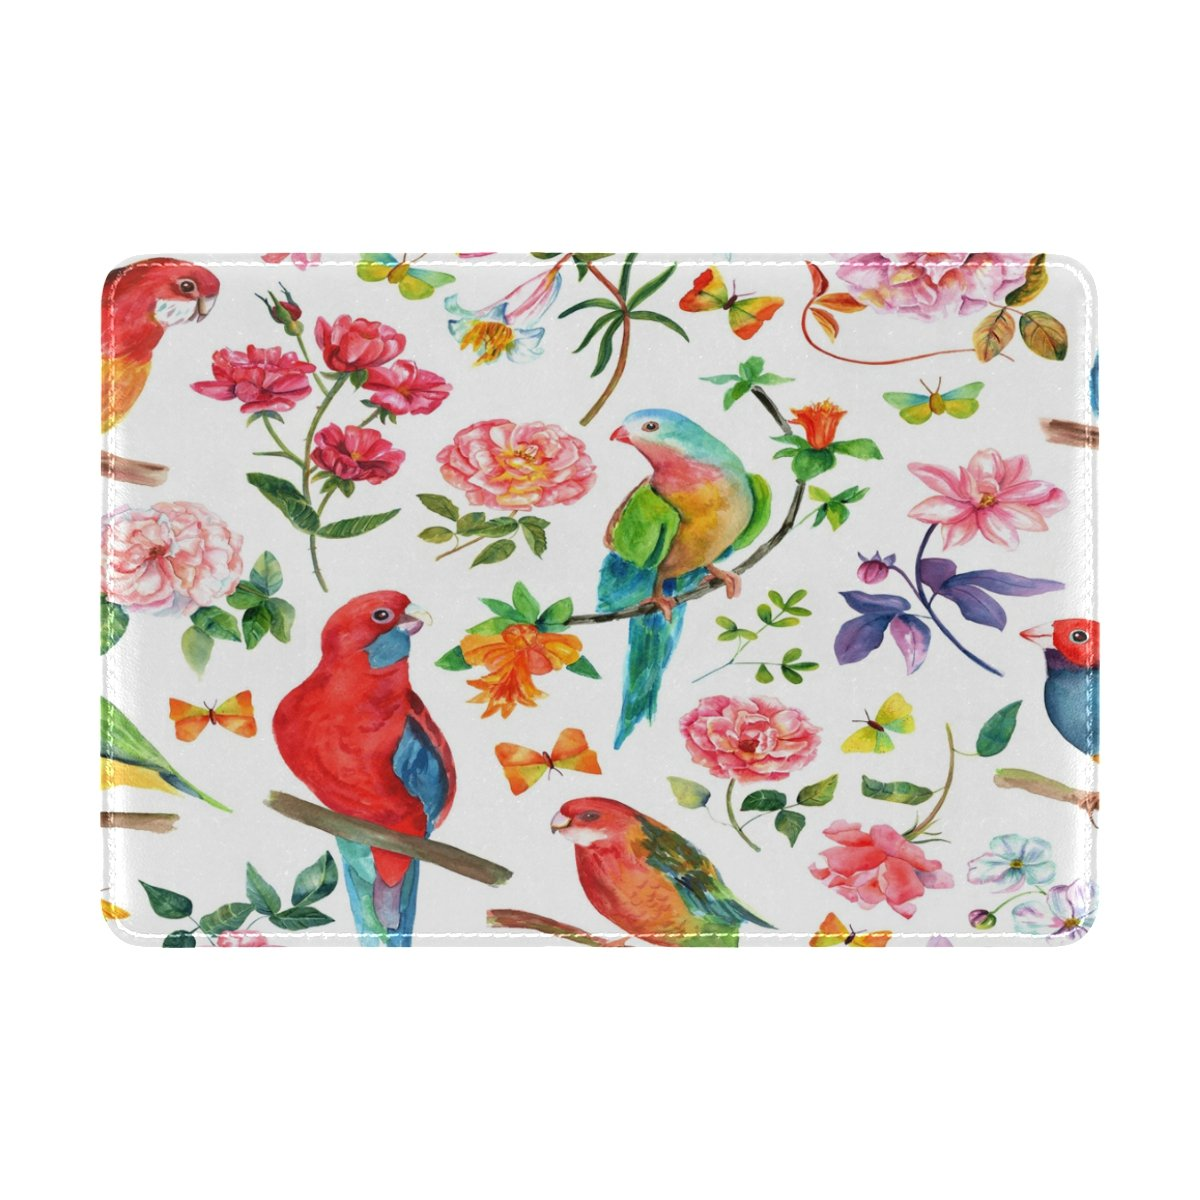 ALAZA Vintage Bird Butterfly Flower PU Leather Passport Holder Cover Case Travel One Pocket